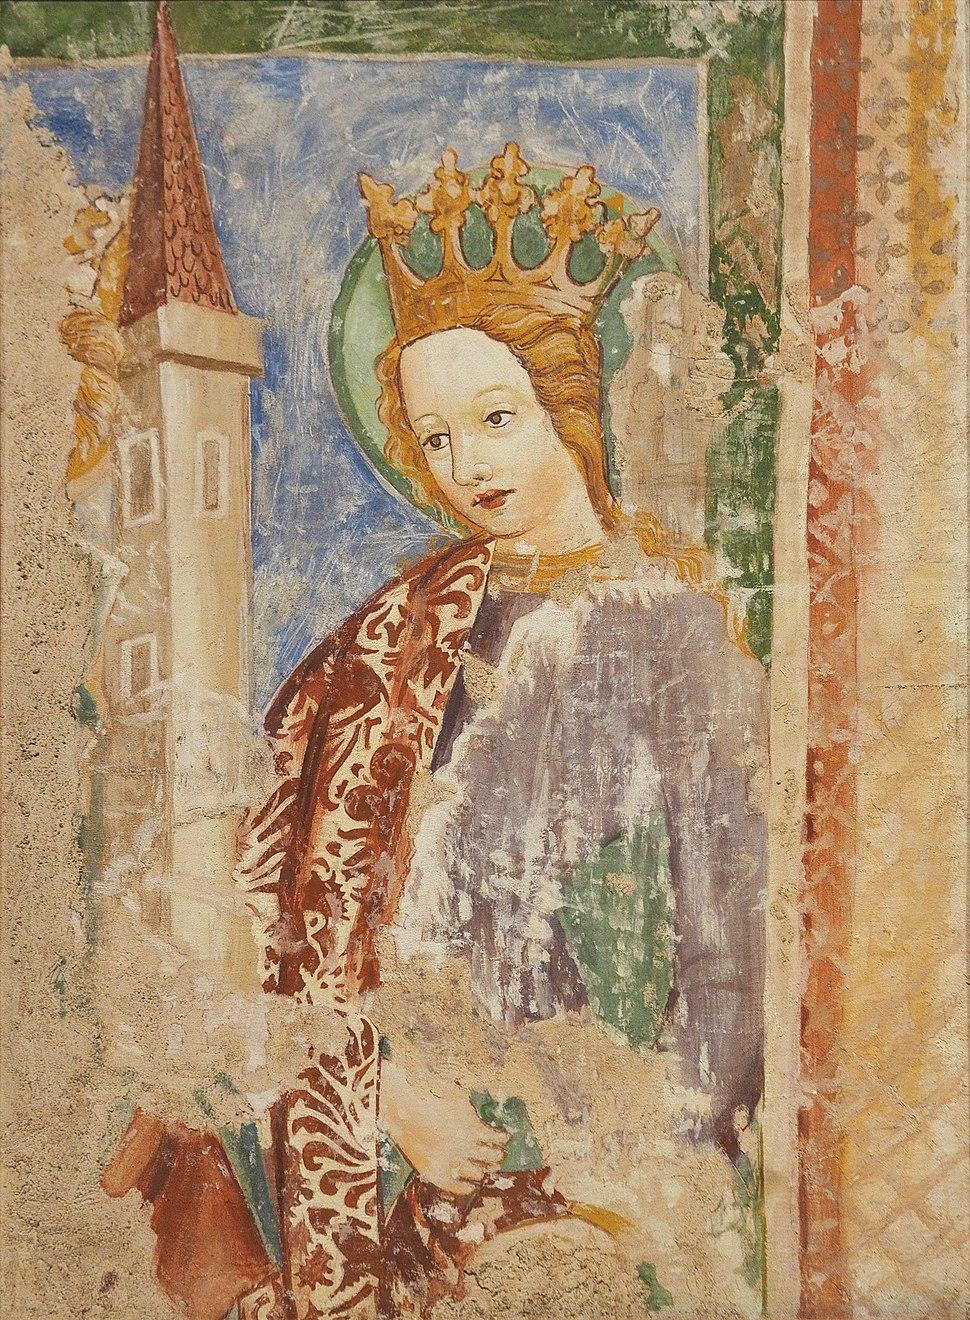 Saint Barbara (National Gallery of Slovenia, copy of church fresco from 1453)